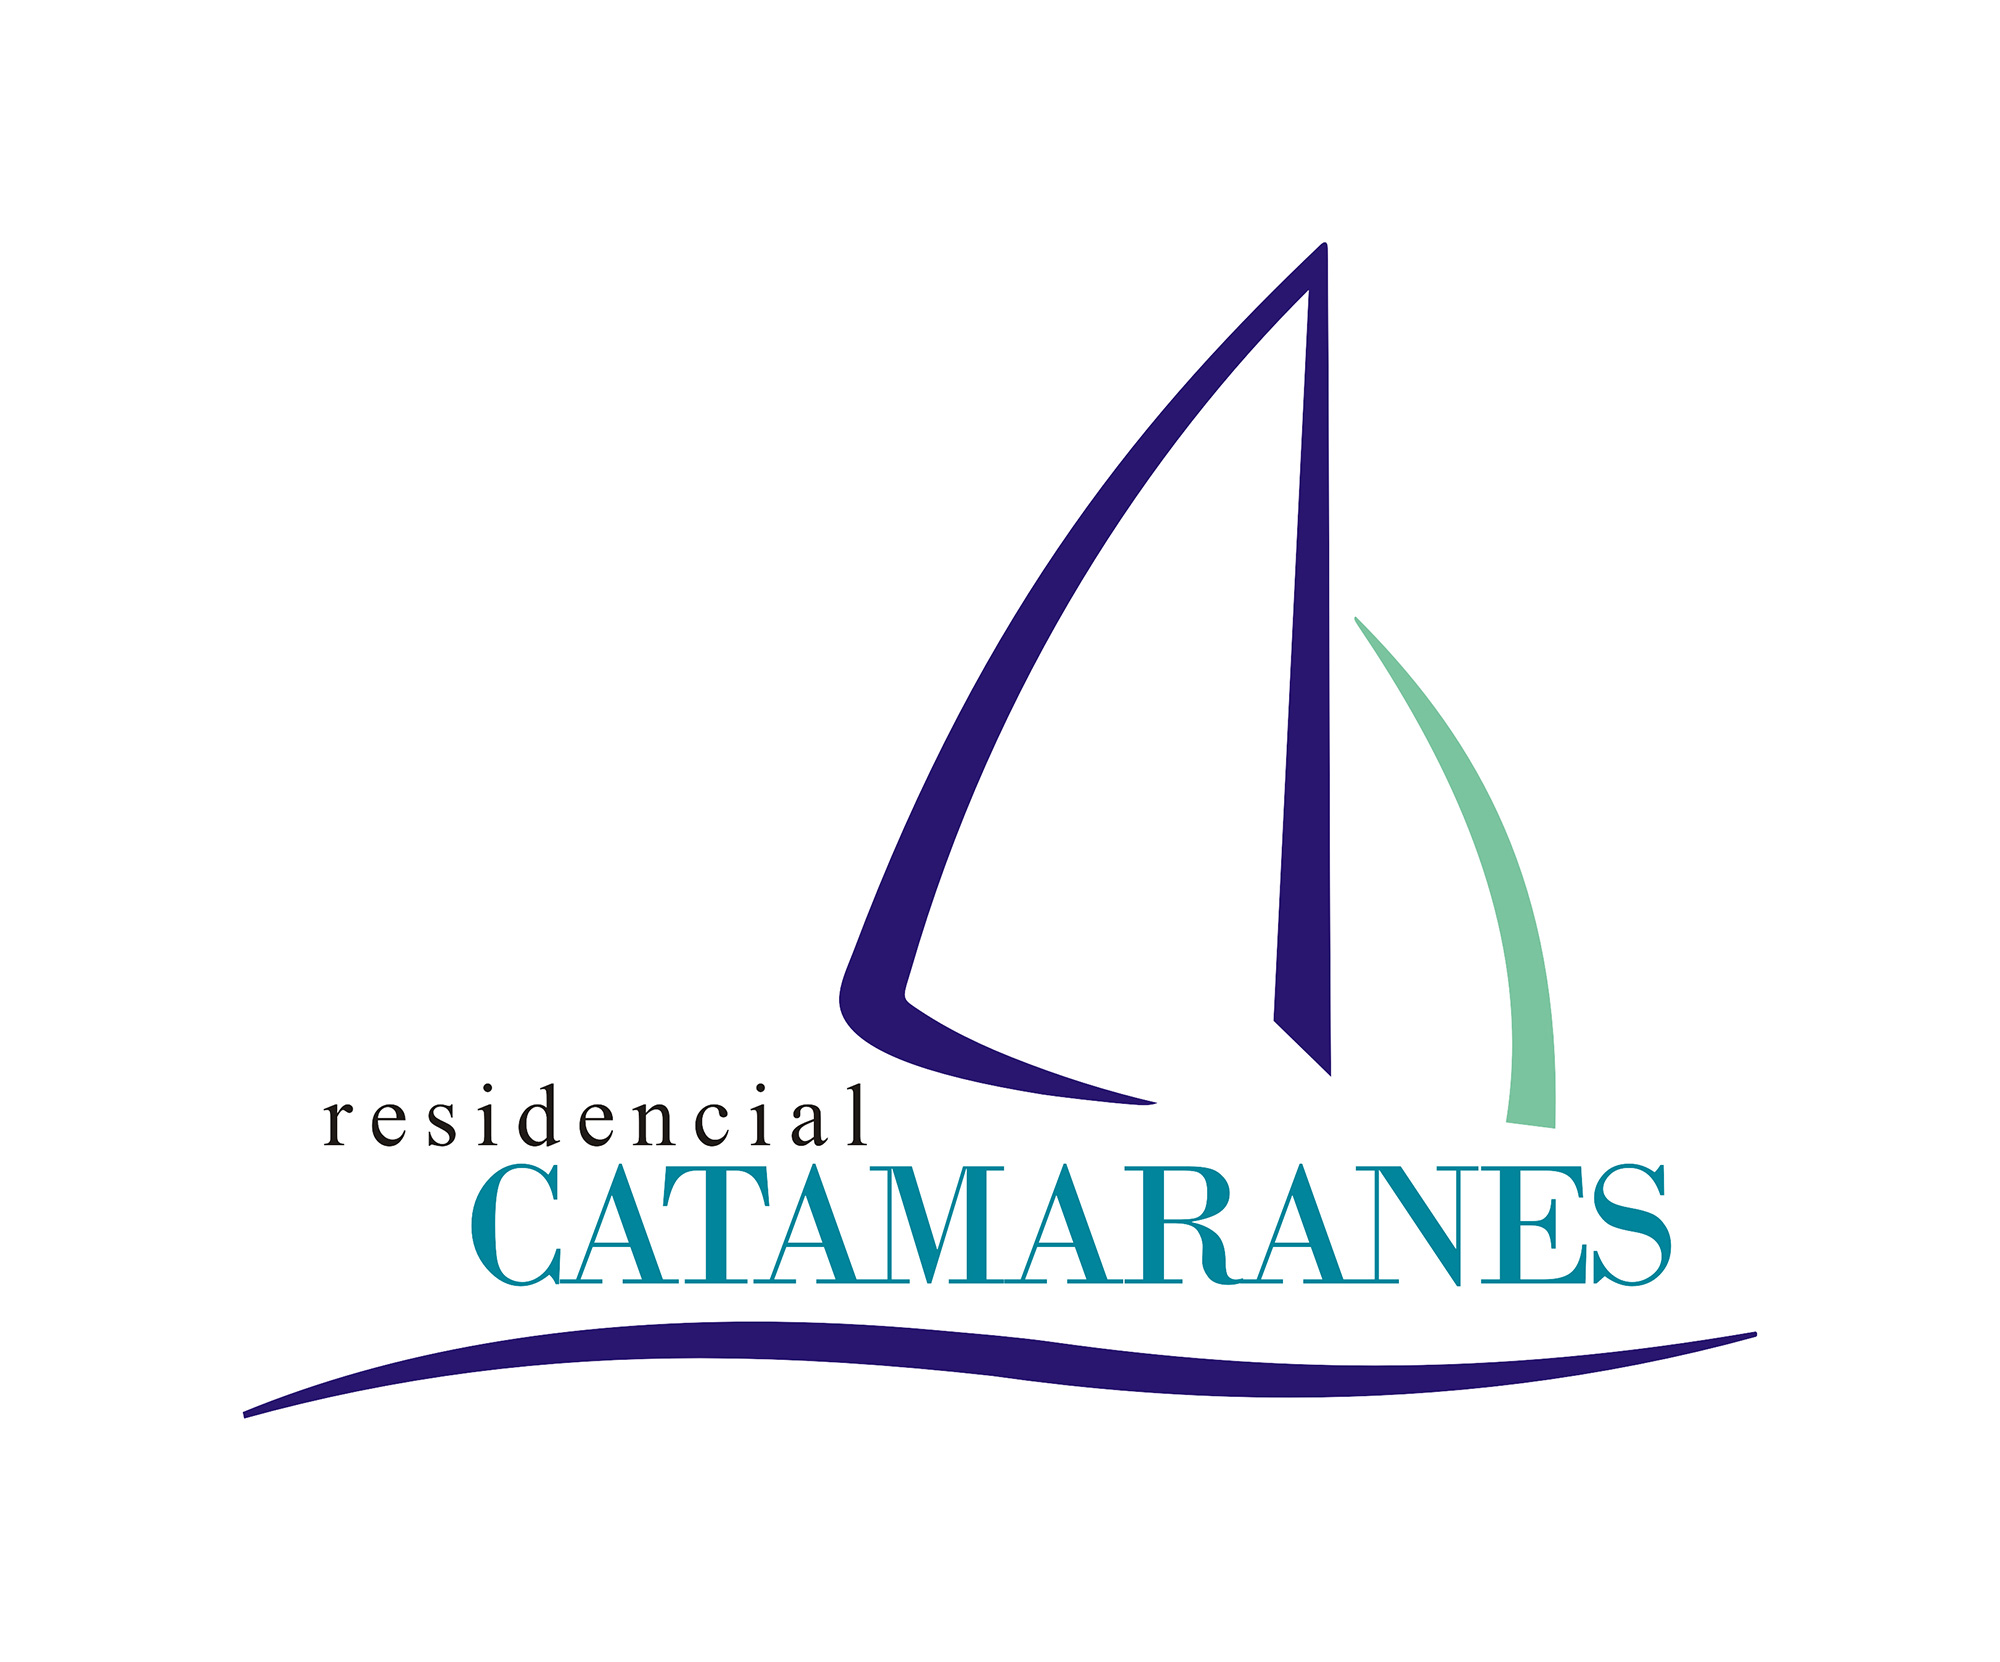 O3 DesigMarketing imobiliario residencial catamaranes Barbieri construçõesn - residencial catamaranes Barbieri construções